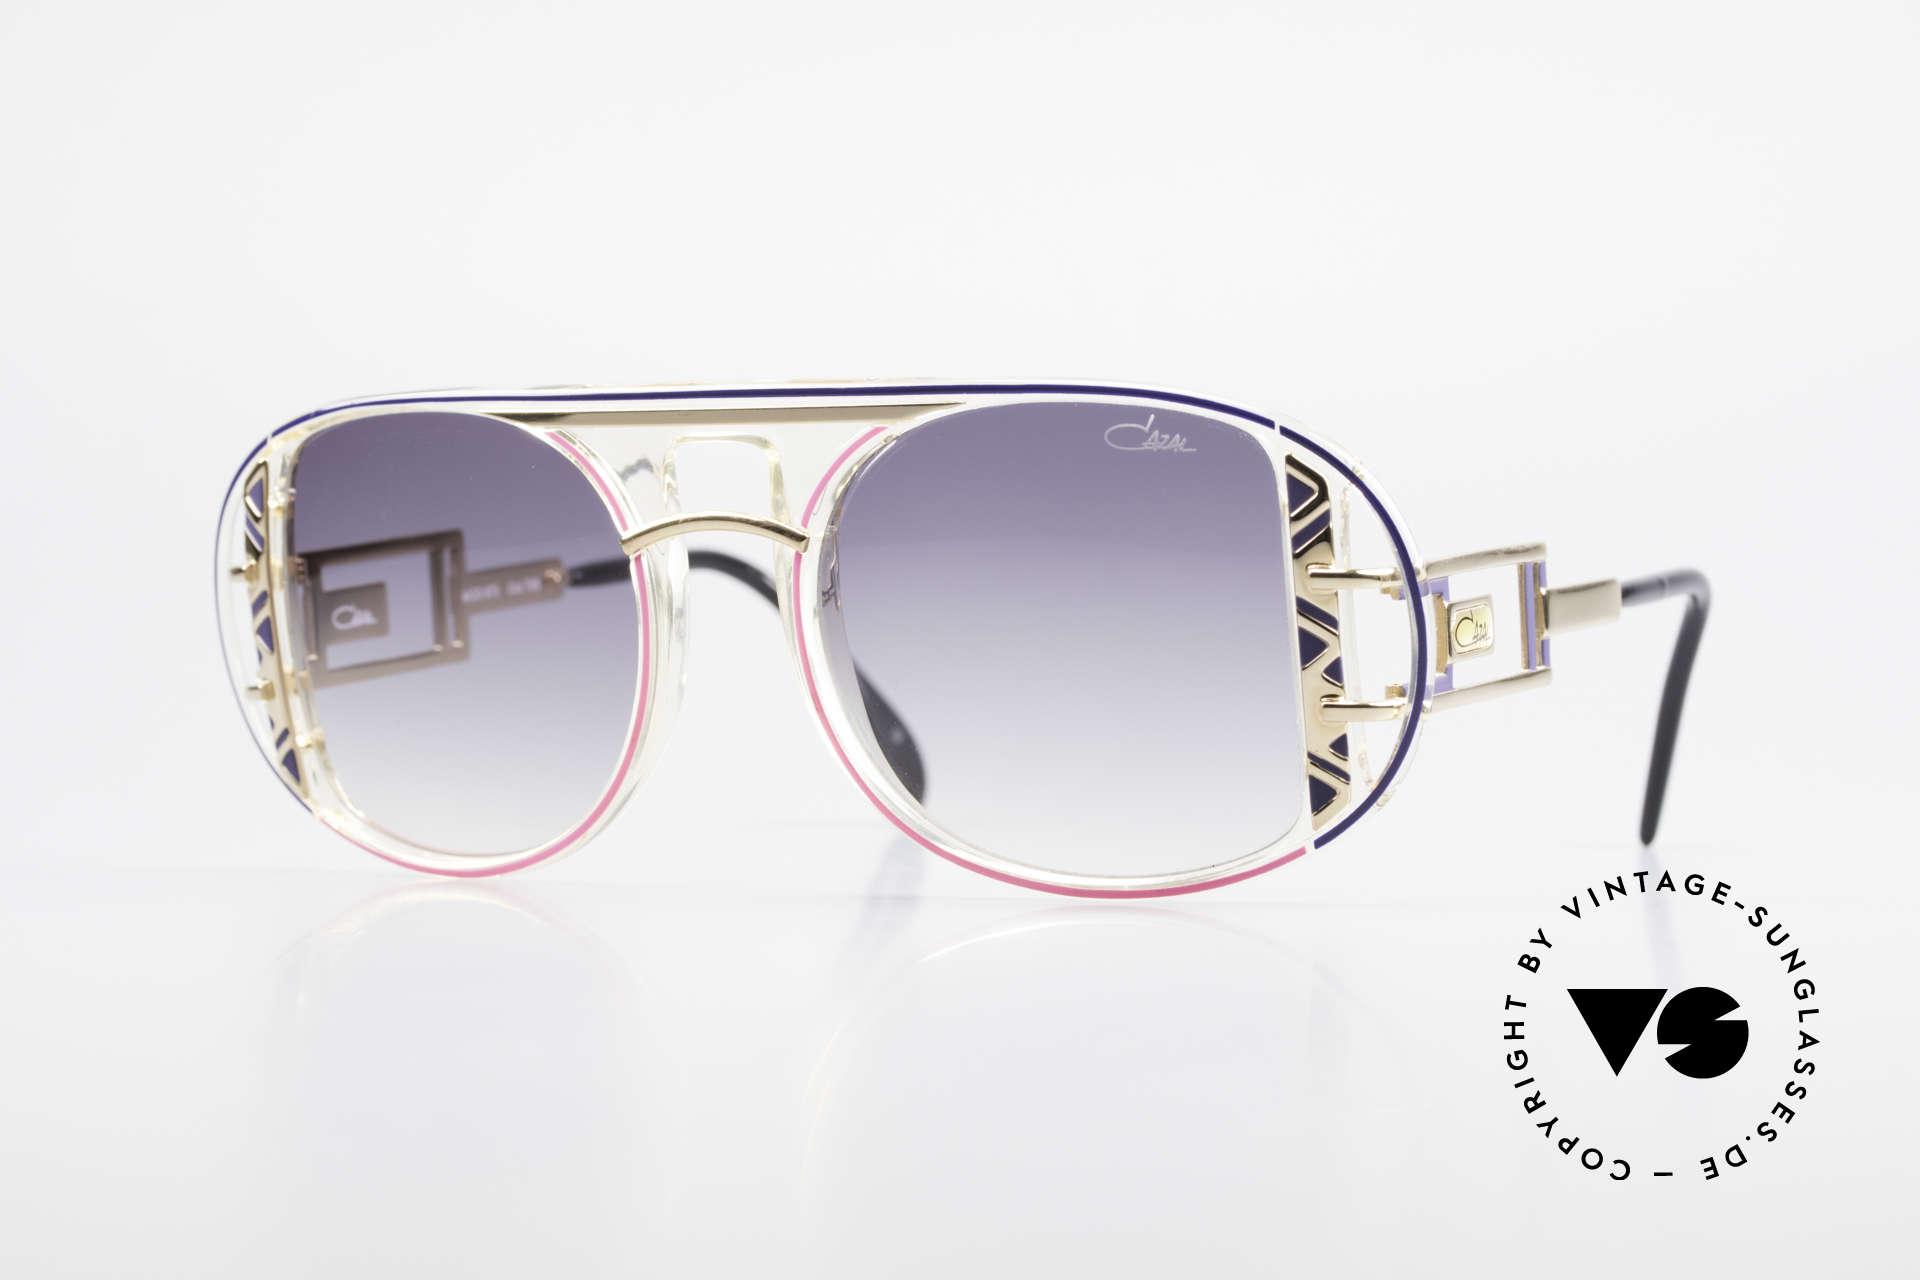 Cazal 875 Rare 90's Designer Sunglasses, made by design-guru CAri ZALloni (Mr. CAZAL), Made for Men and Women